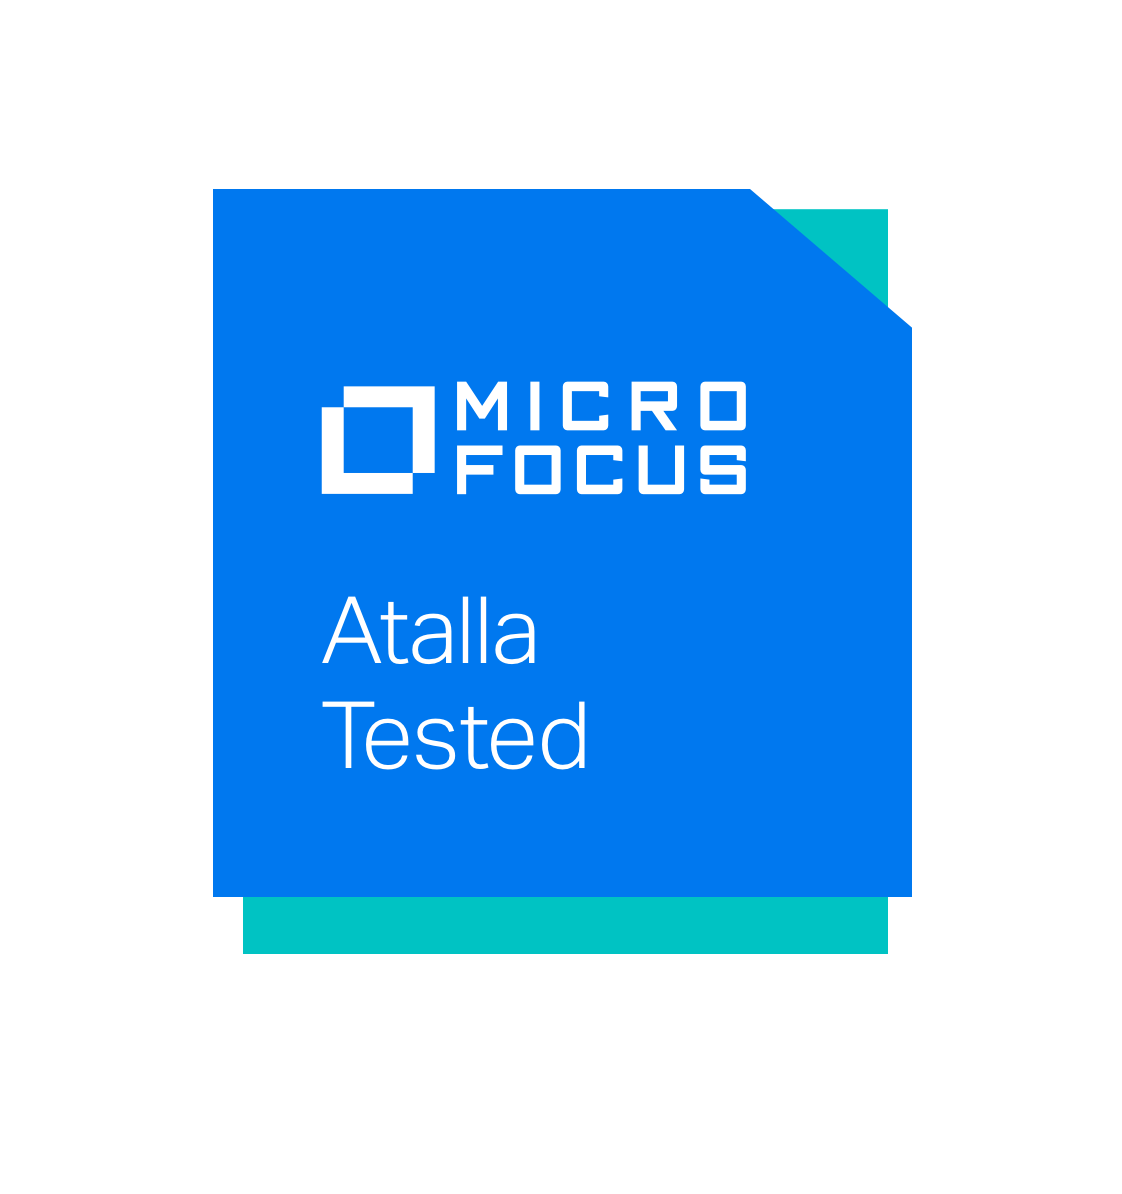 mf_Atalla Tested@3x.png